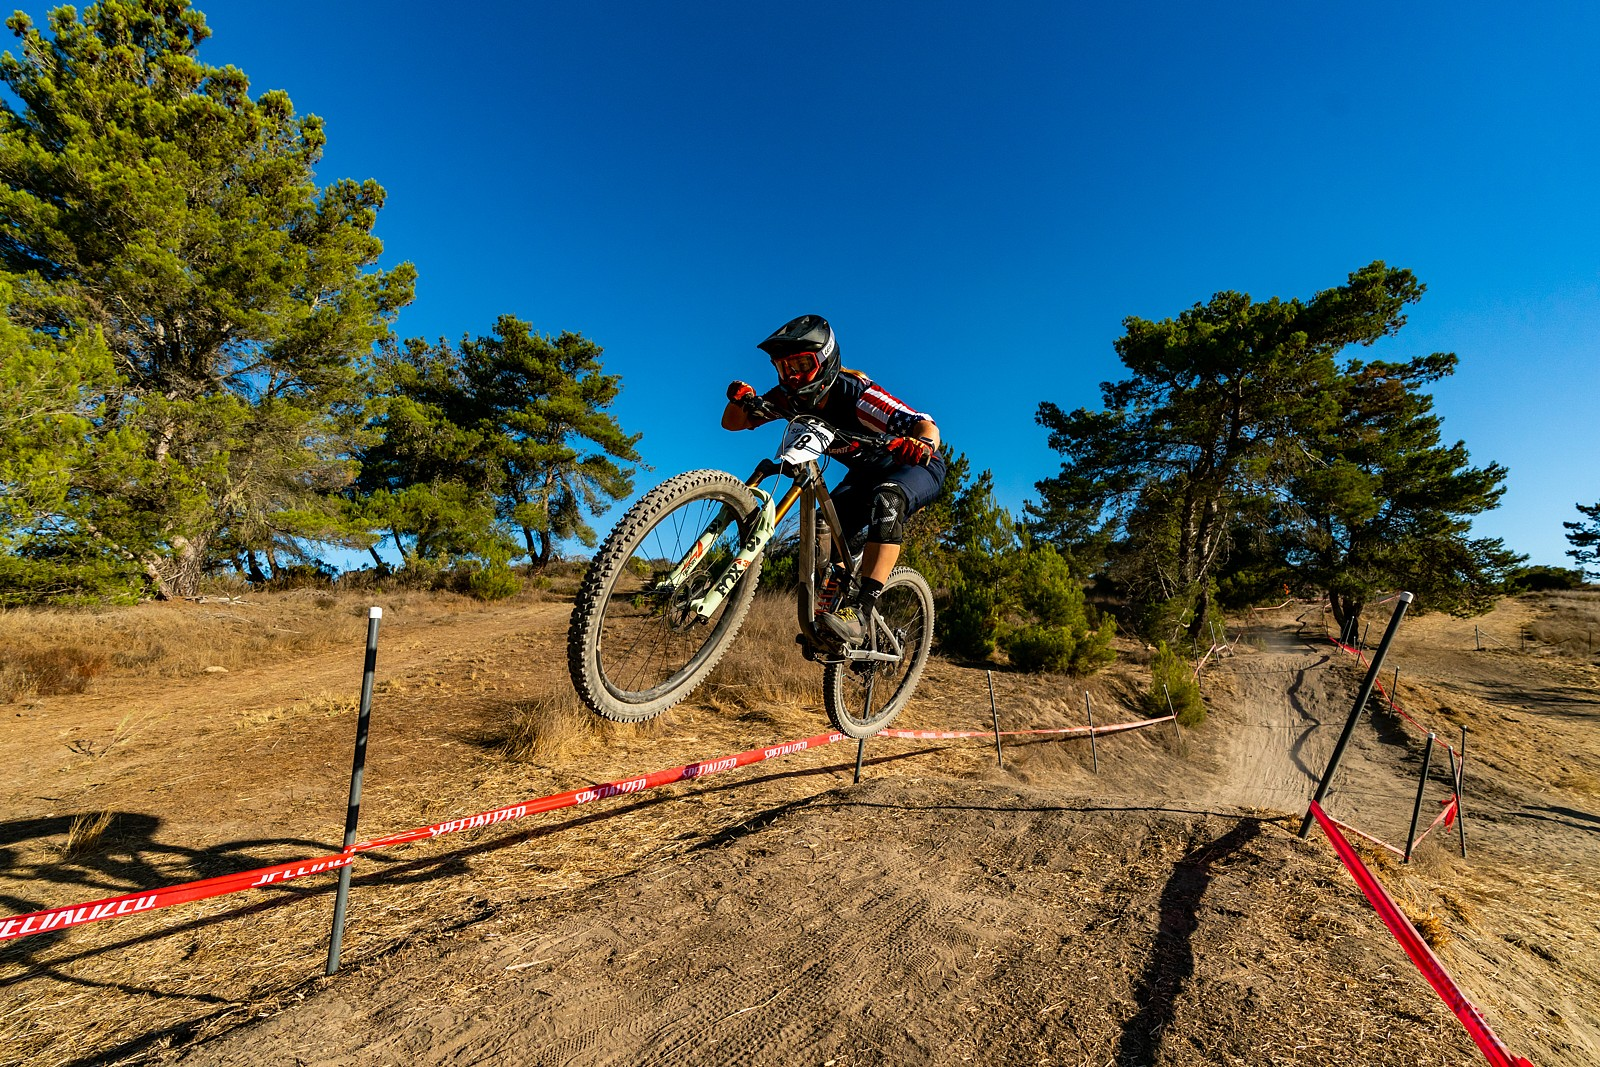 Amy Morrison - Zuestman - Mountain Biking Pictures - Vital MTB